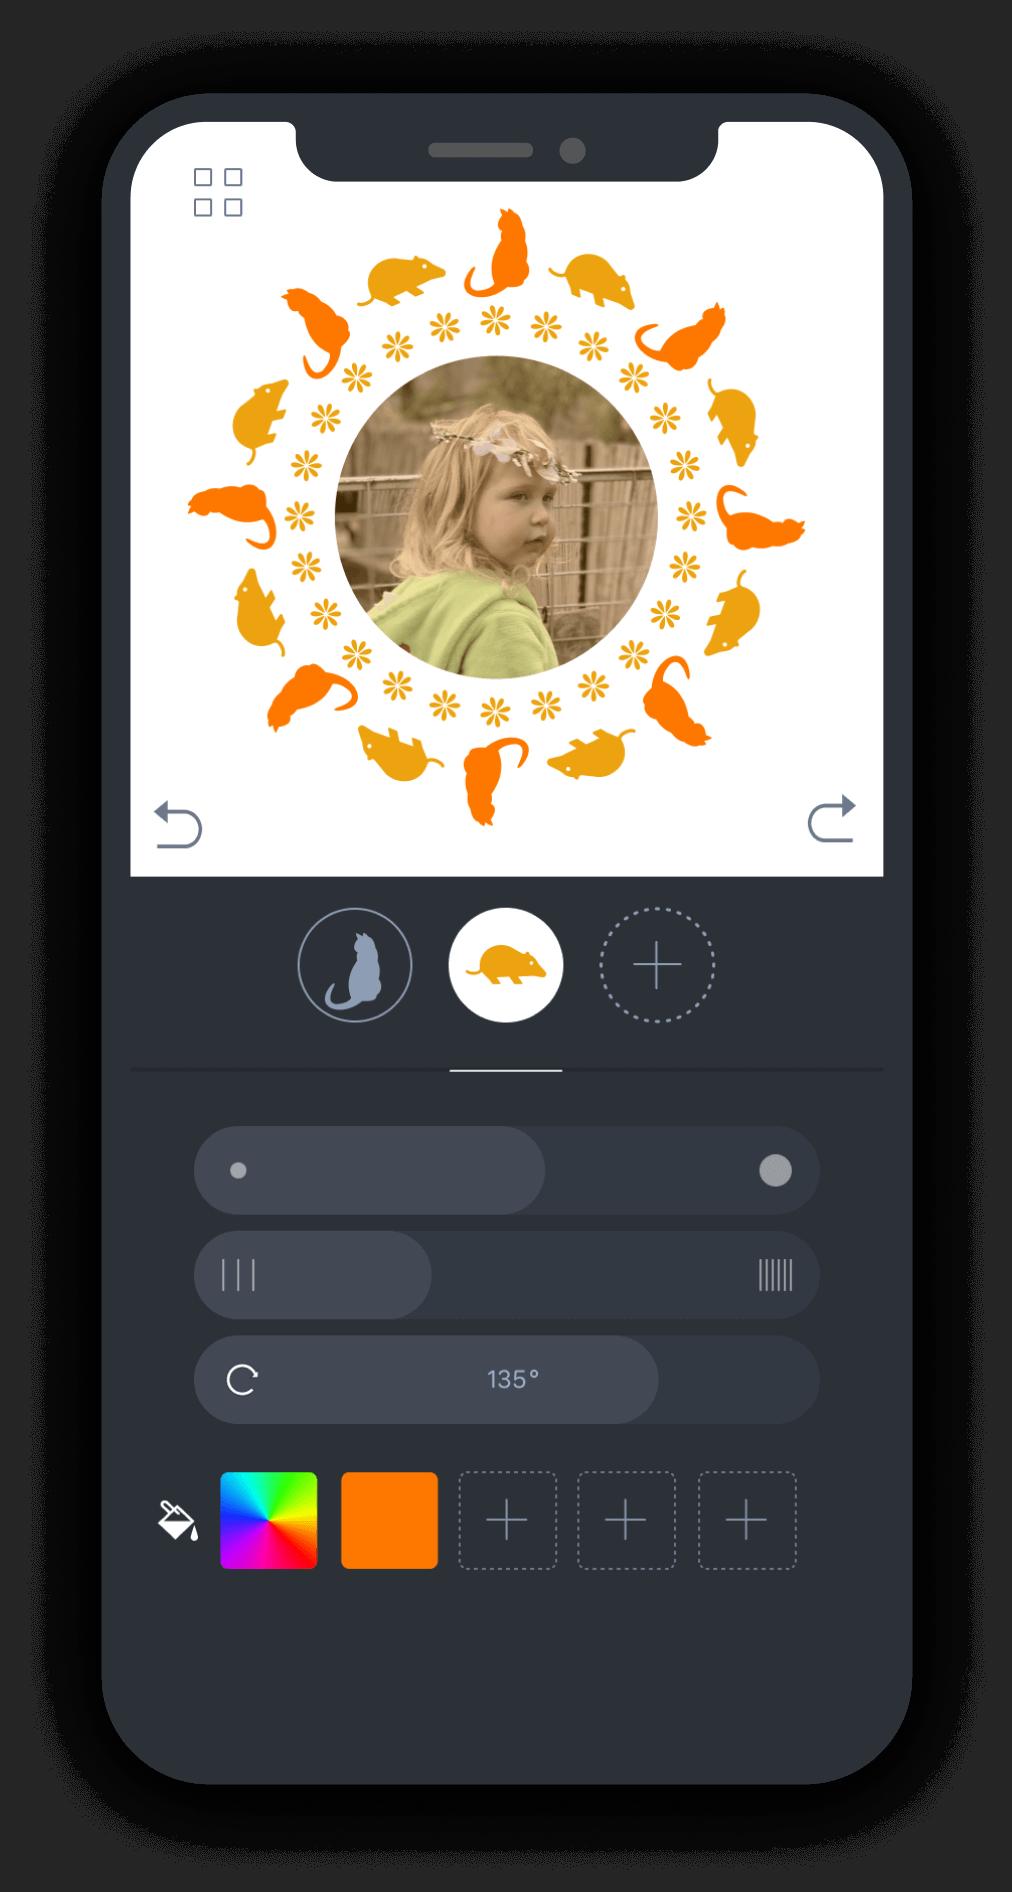 mobile_02_attributes